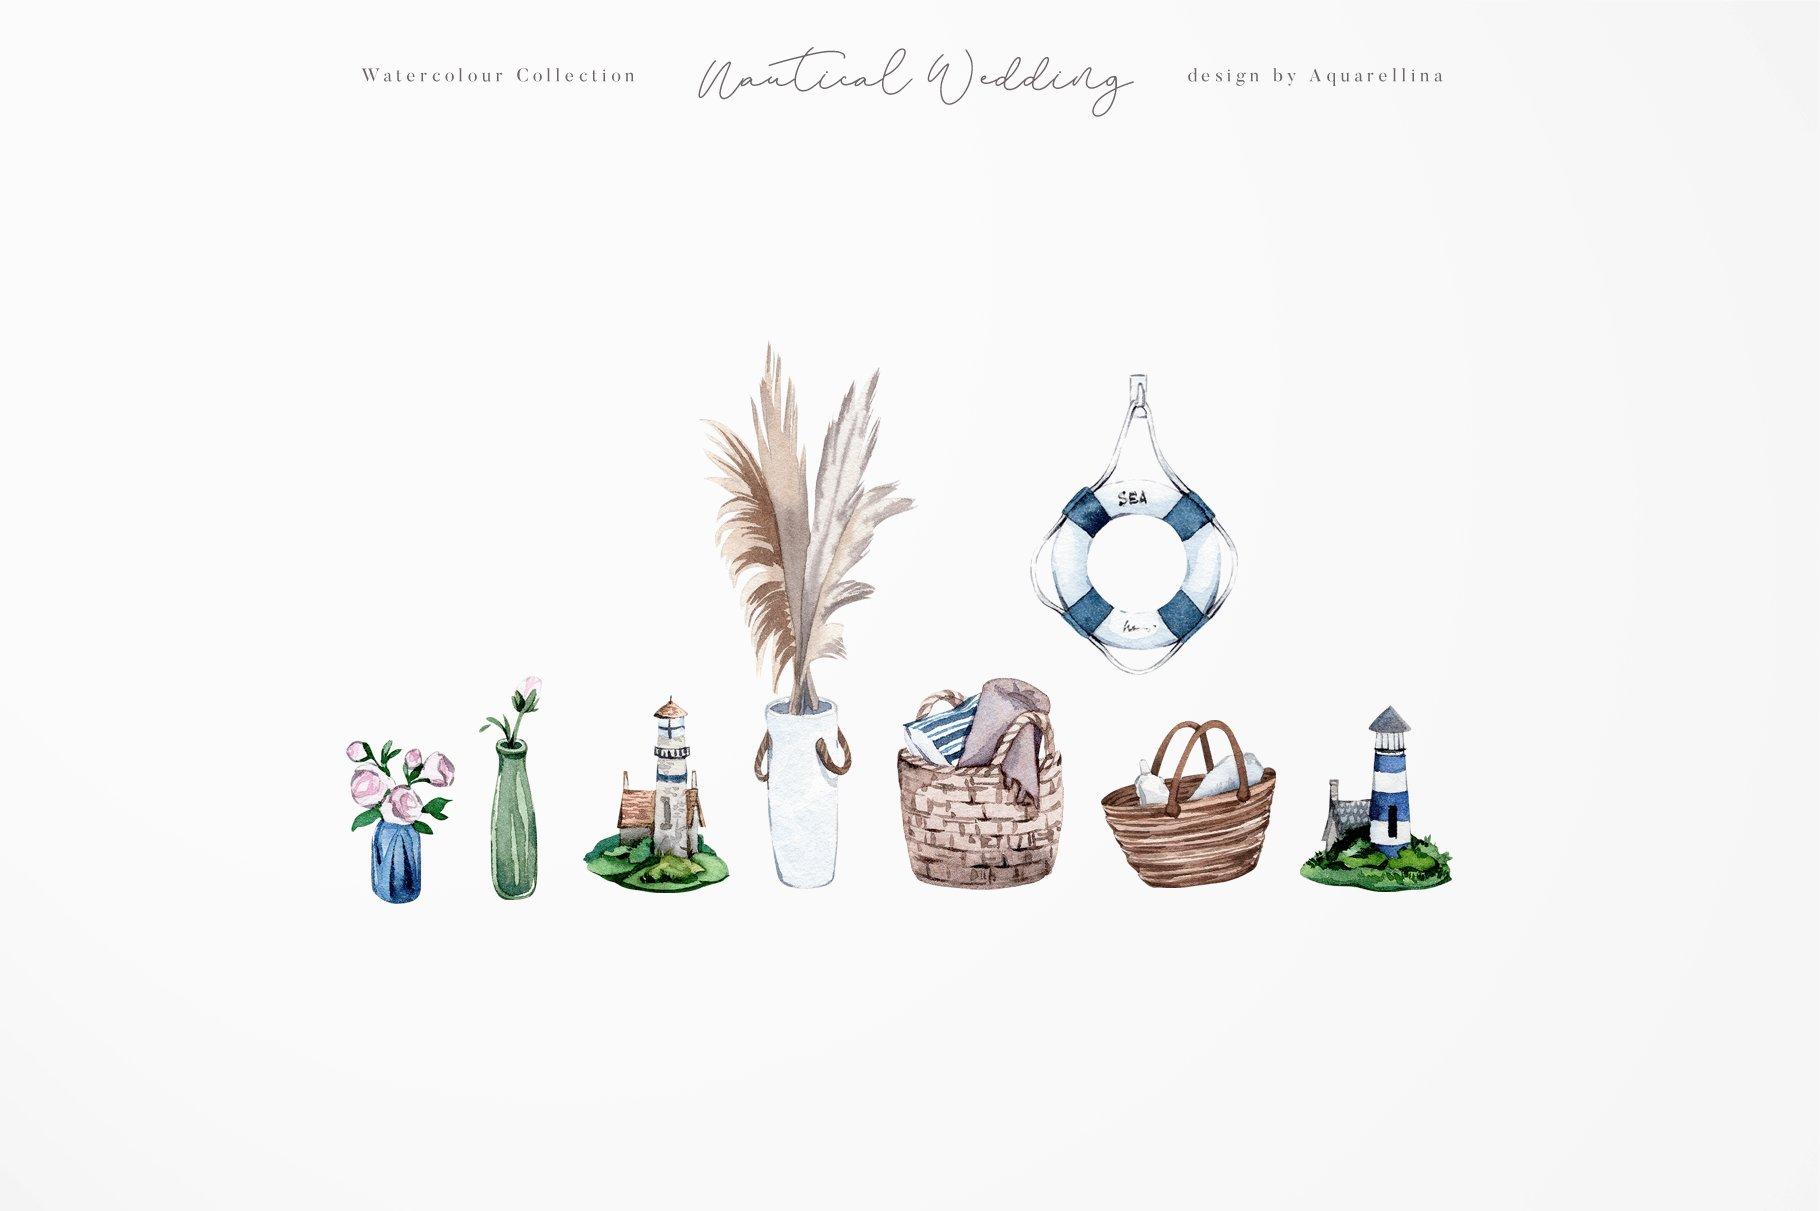 nautical beach wedding illustrations by aquarellina screenshot 11 12